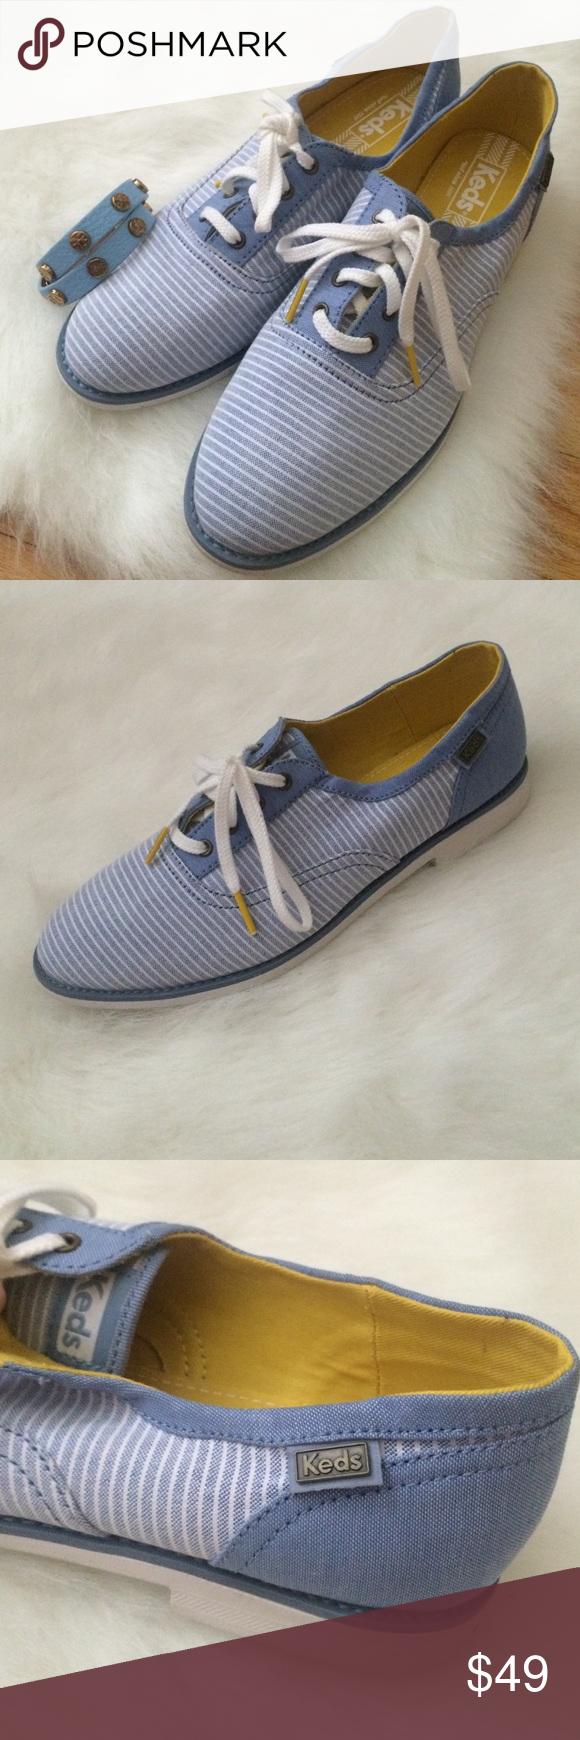 Denim Blue and White Striped Keds, Size